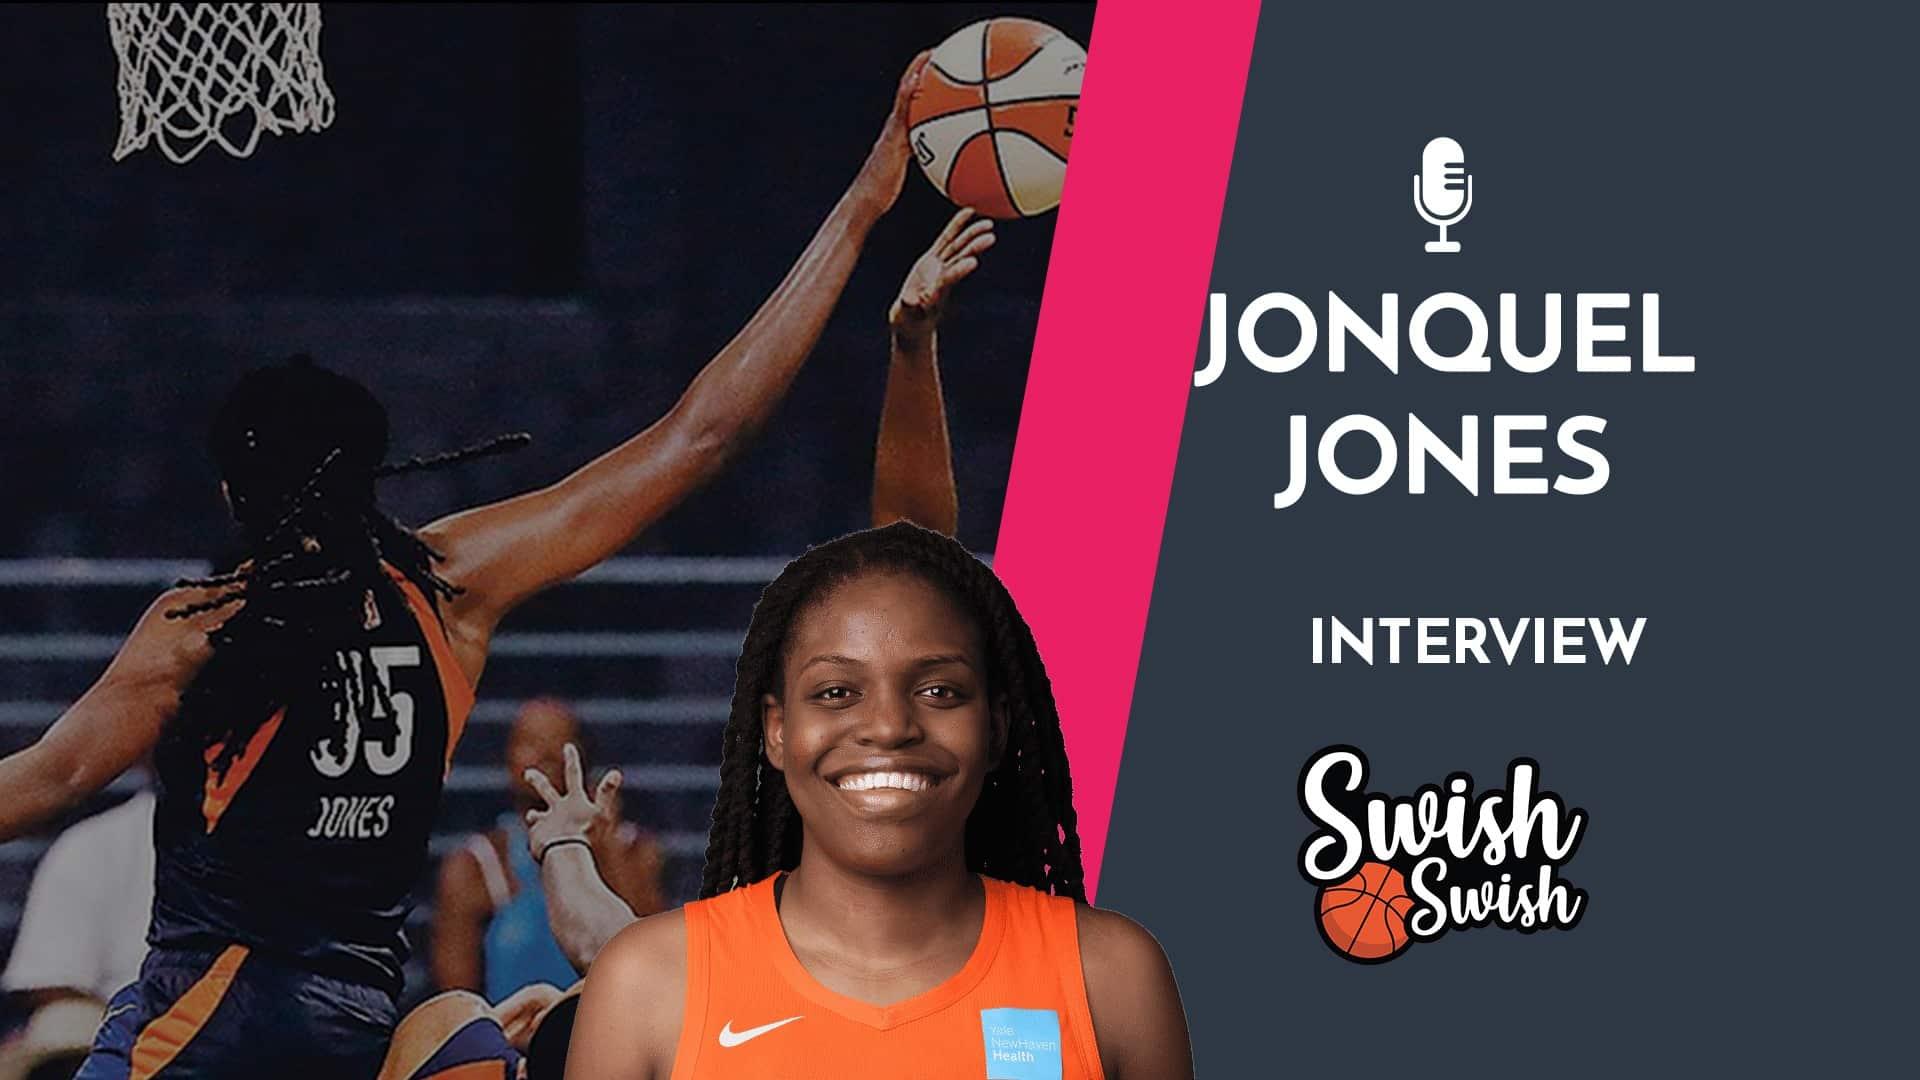 Jonquel Jones